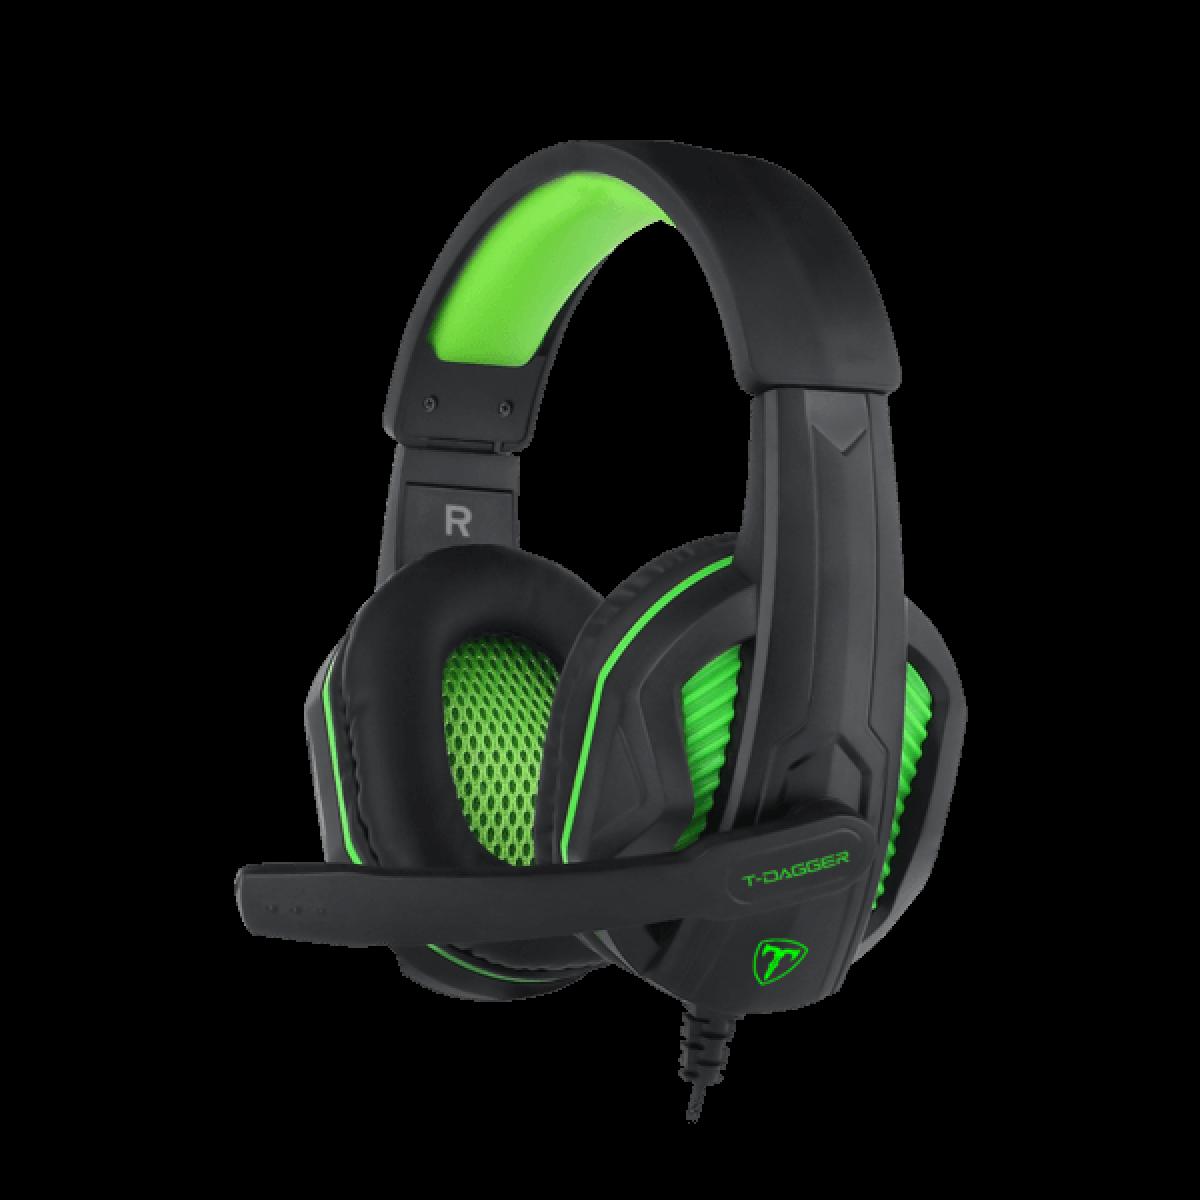 Headset Gamer T-Dagger Cook 2, 2x3.5mm, Black/Green, T-RGH100-1